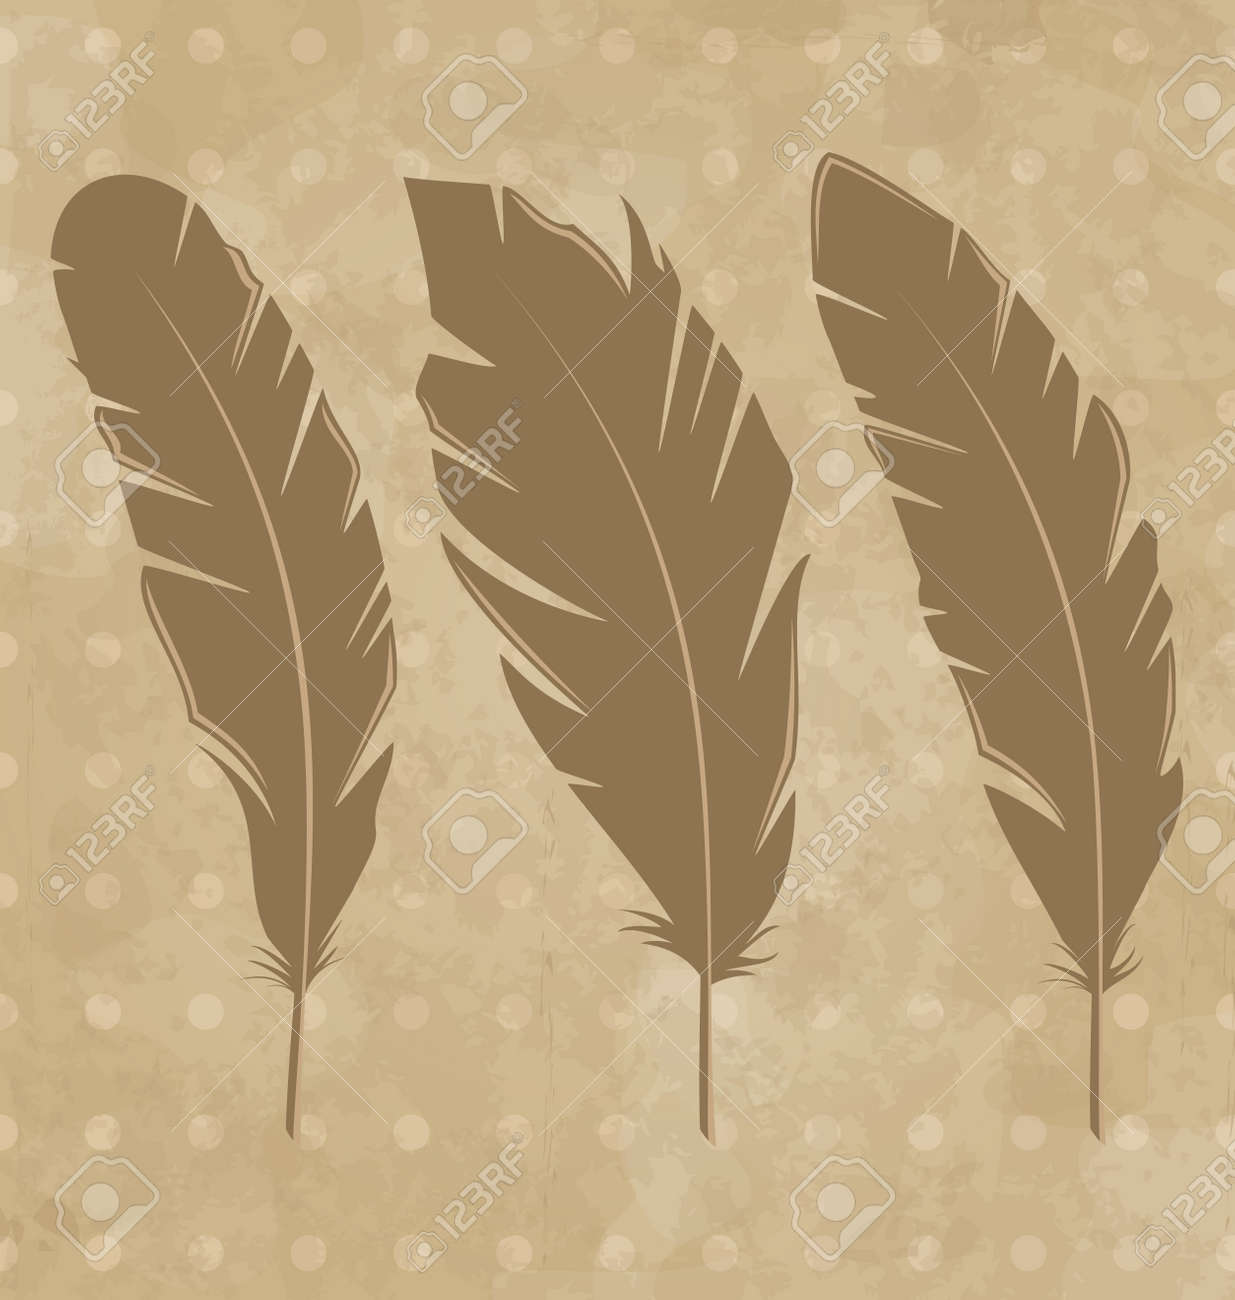 Illustration set vintage feathers on grunge background - vector Stock Illustration - 22096351